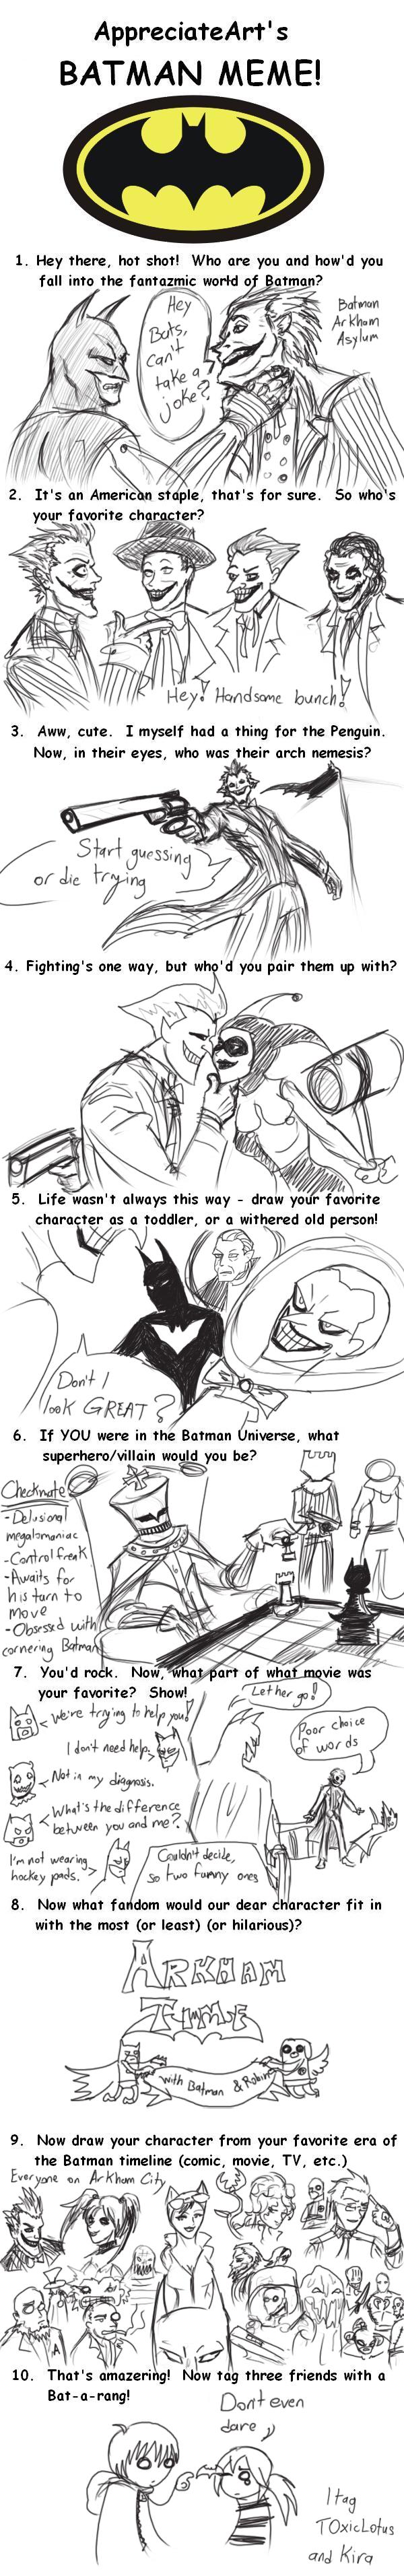 The Batman Meme by LanceDarkness